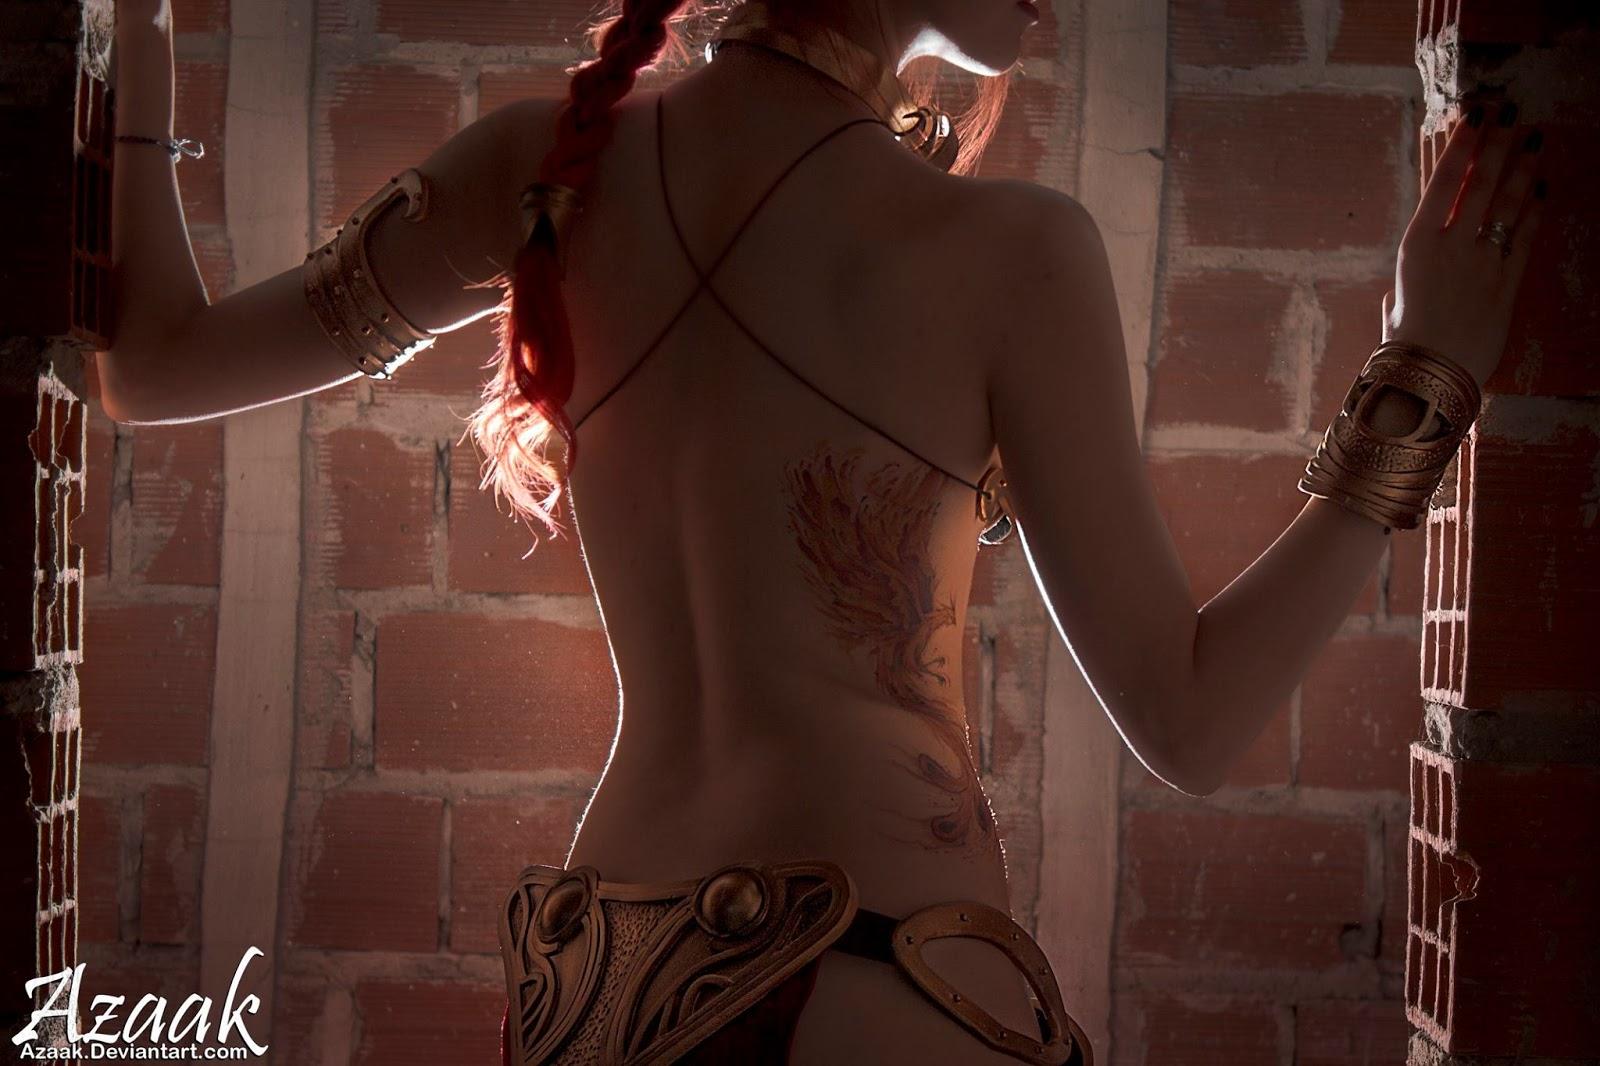 Slave_Leia-Marianne_Black-004.jpg